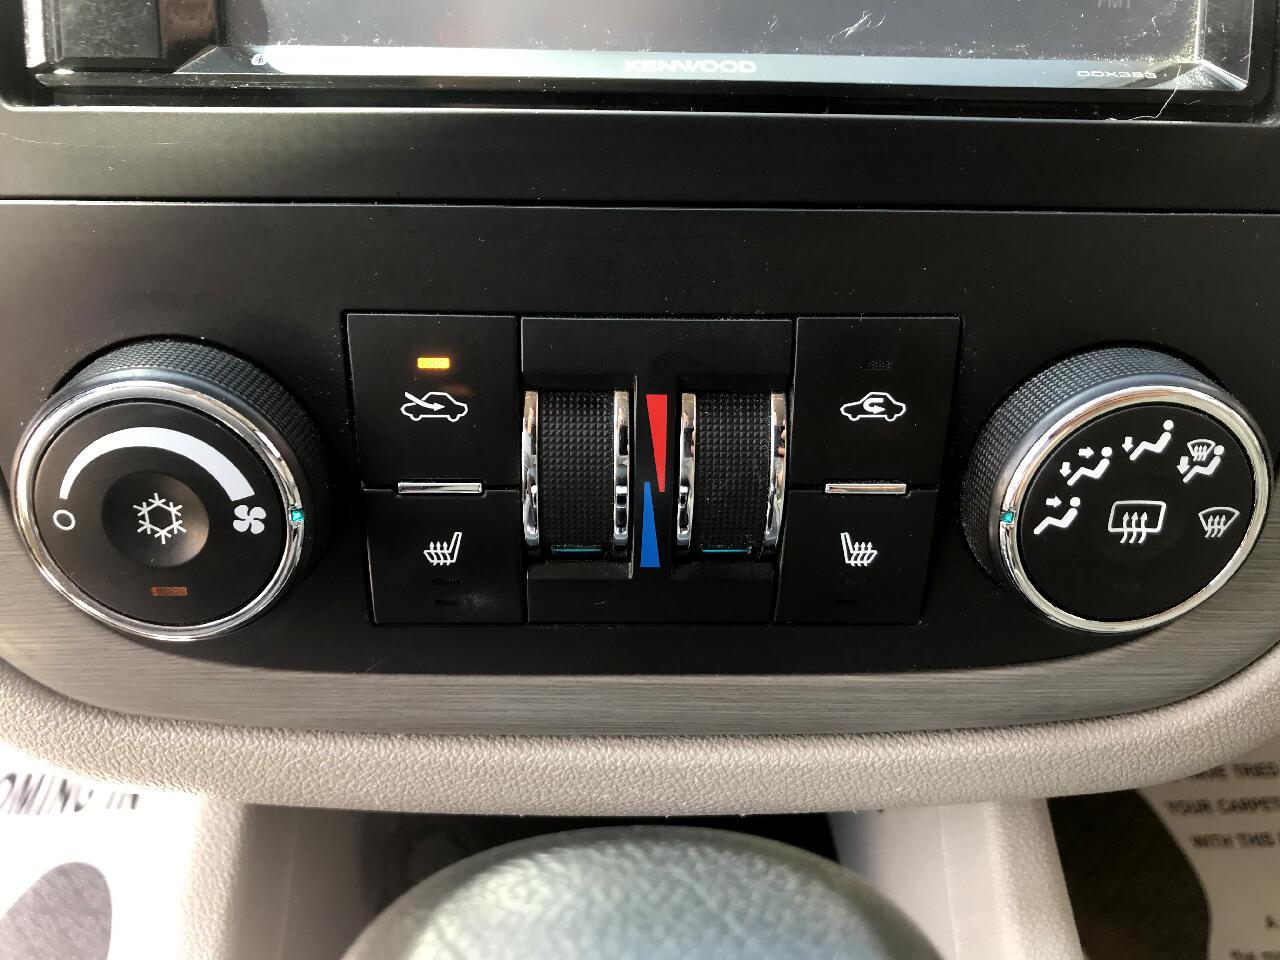 2006 Chevrolet Impala 4dr Sdn LTZ